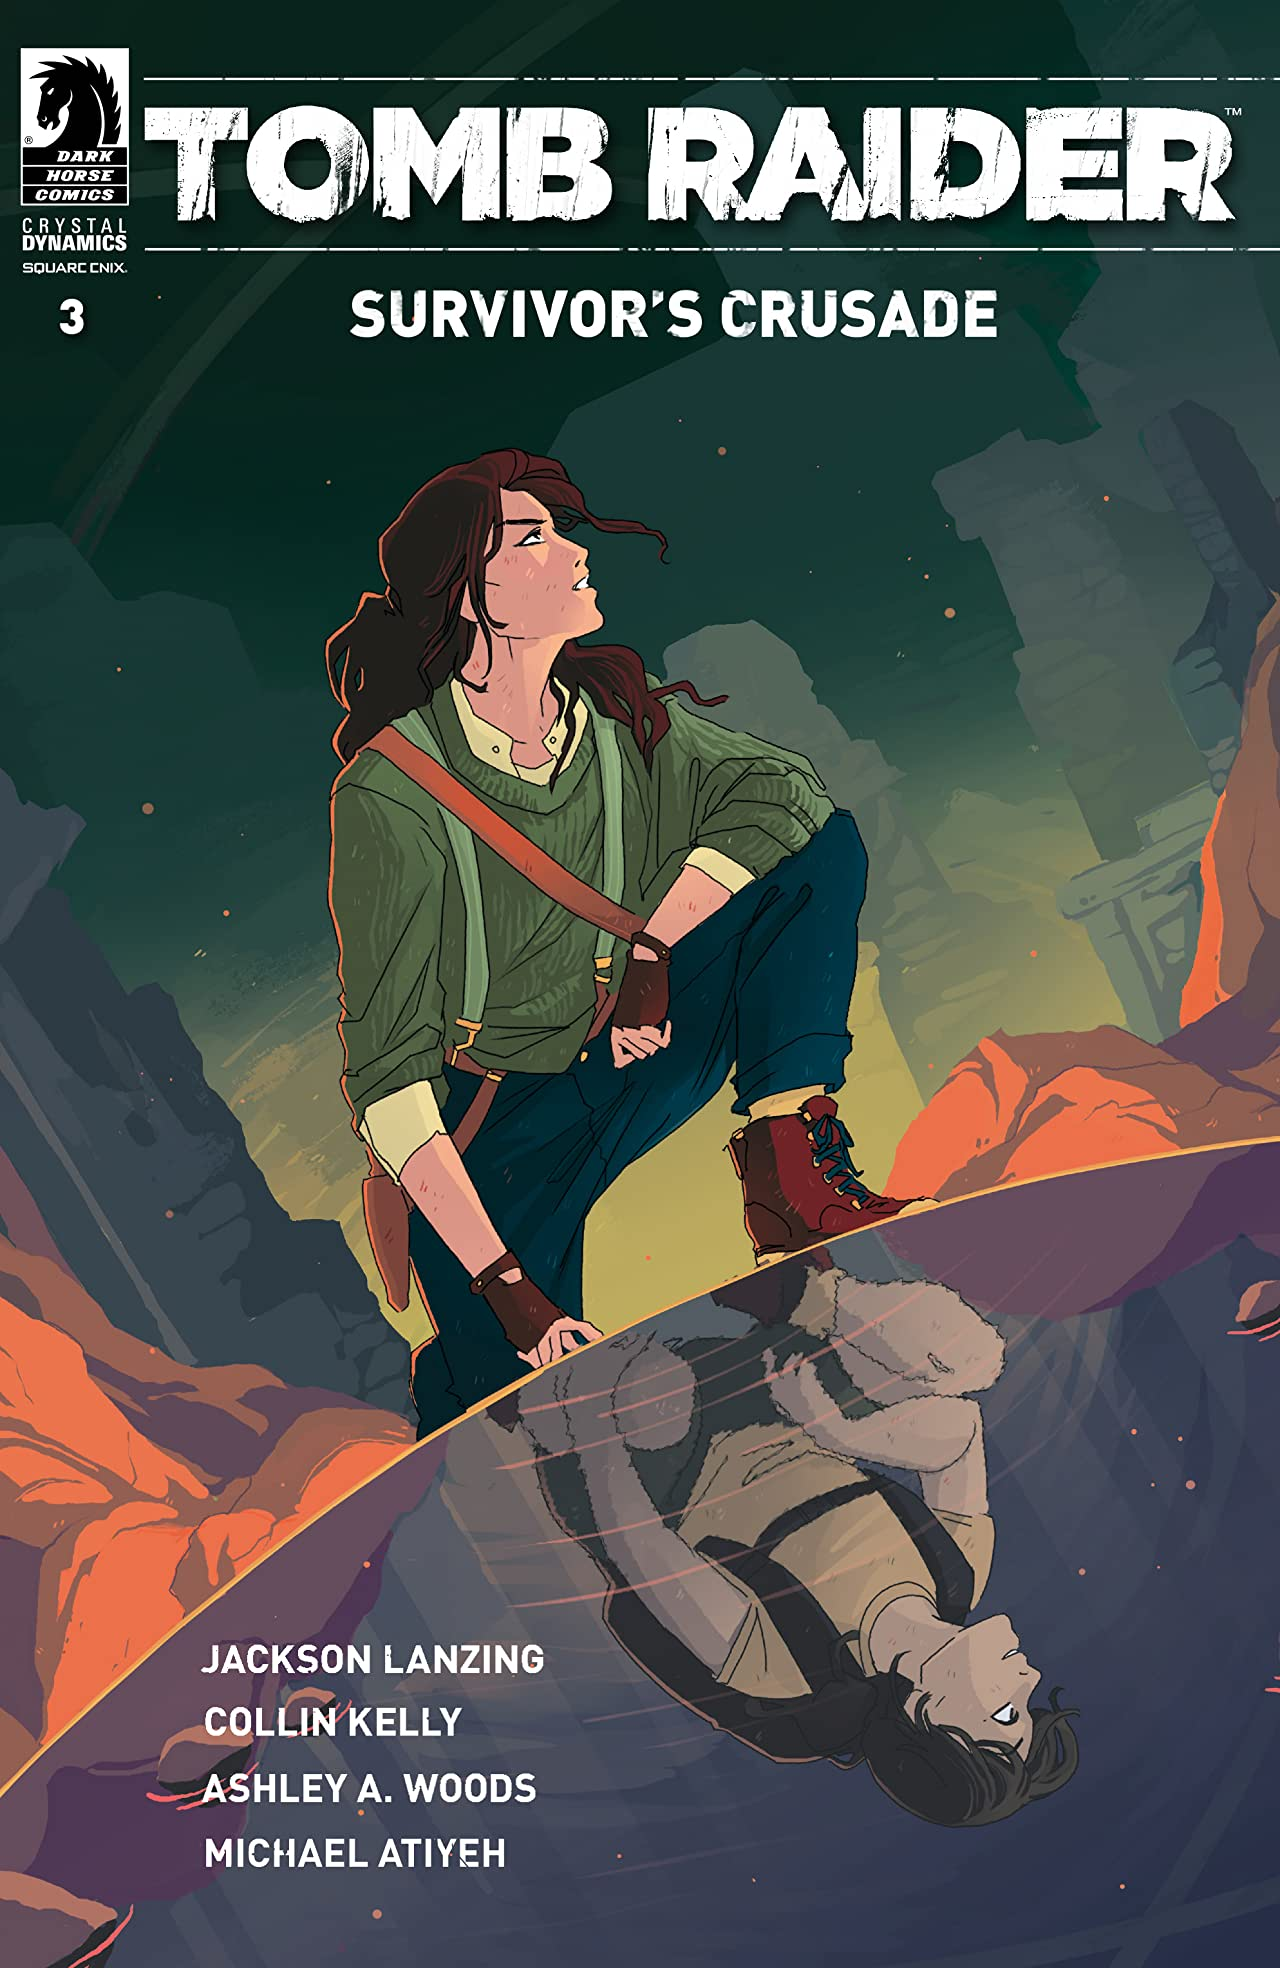 Tomb Raider: Survivor's Crusade #3 ...